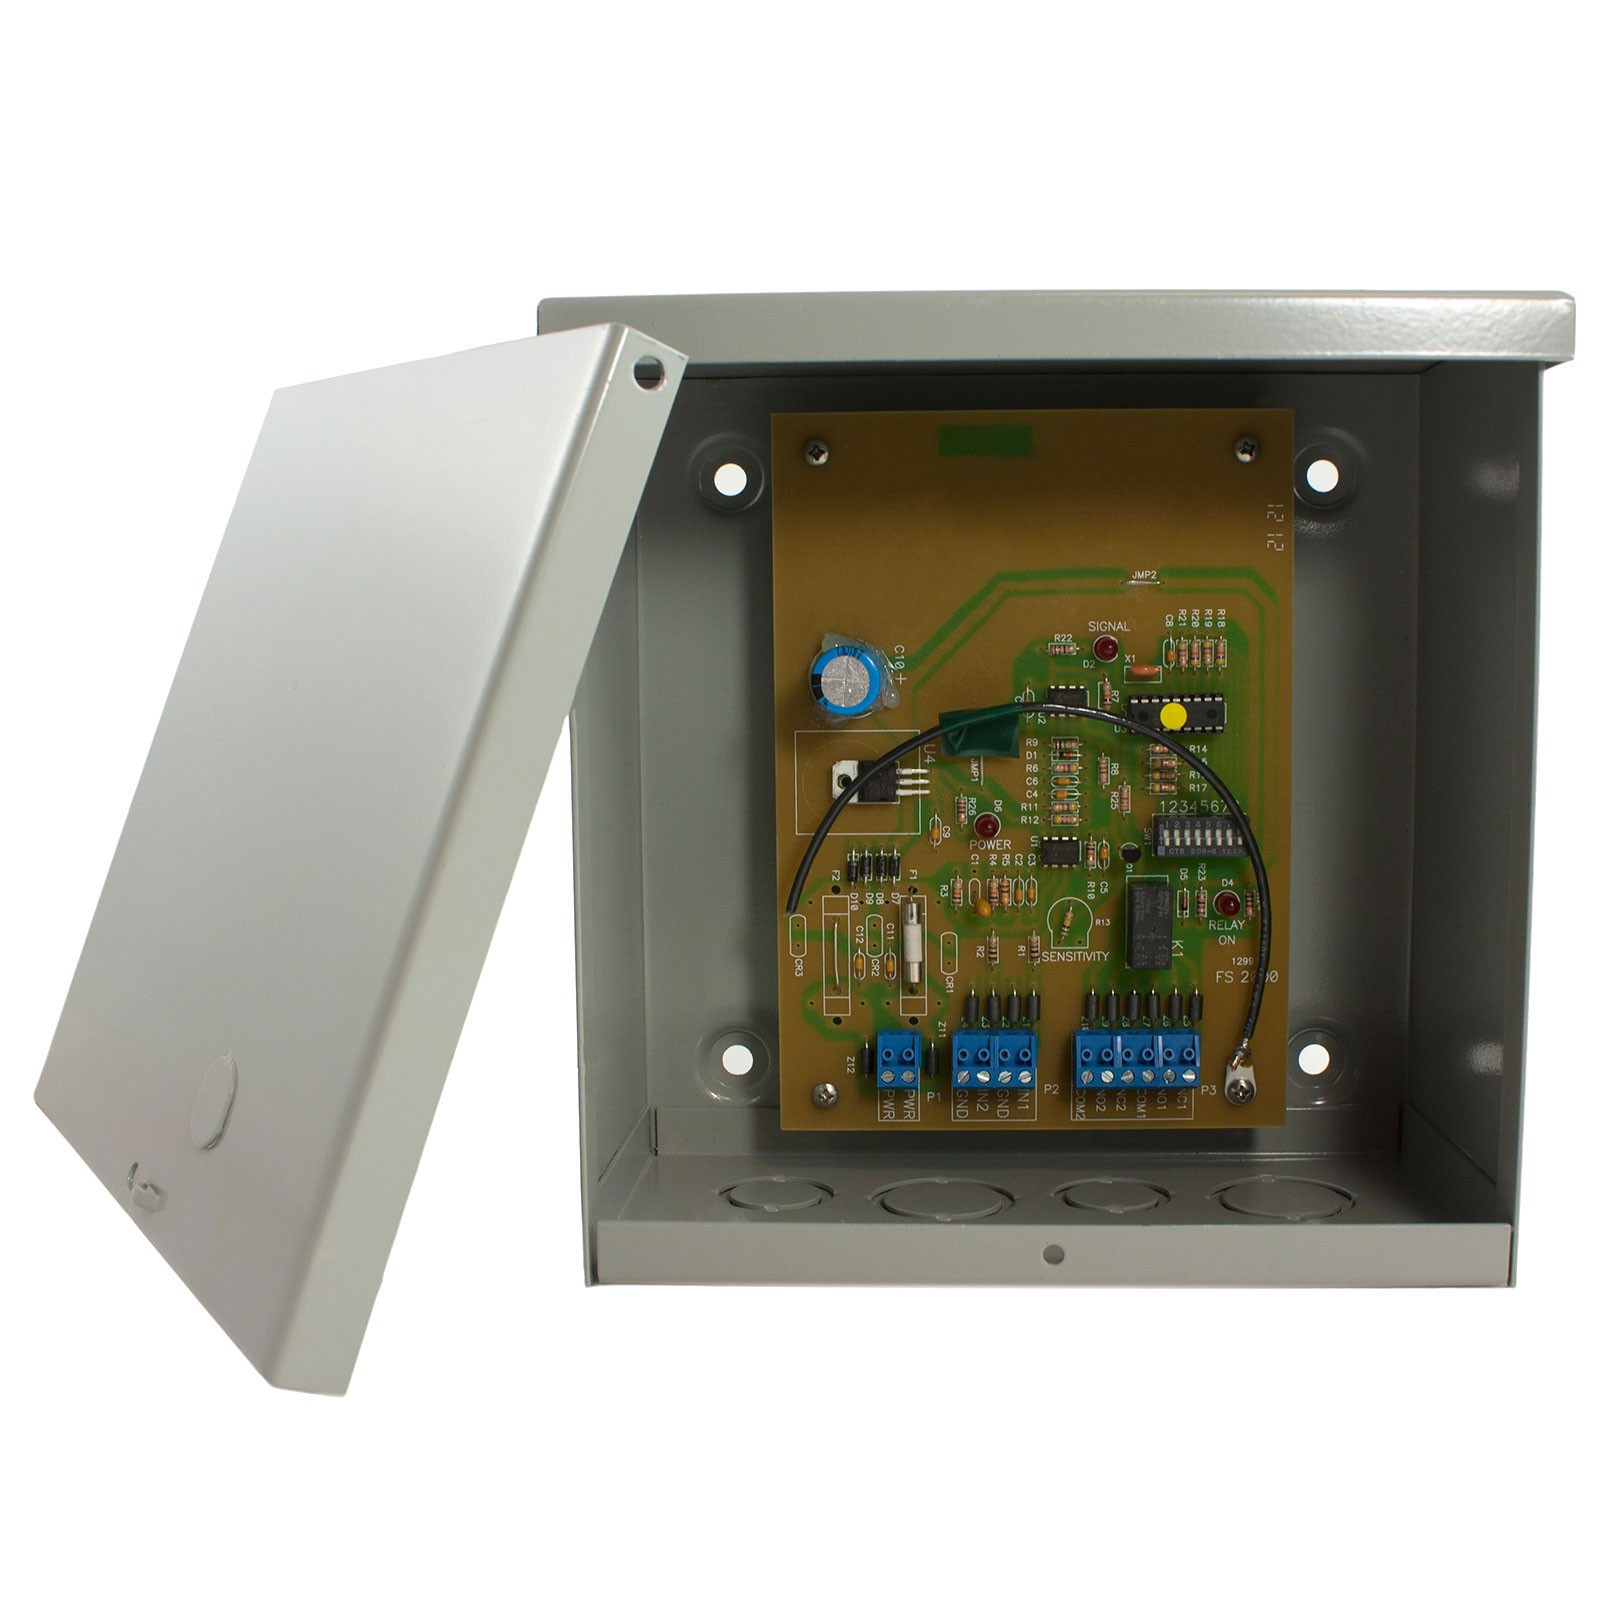 3m Opticom Strobe Wiring Diagram. . Wiring Diagram on